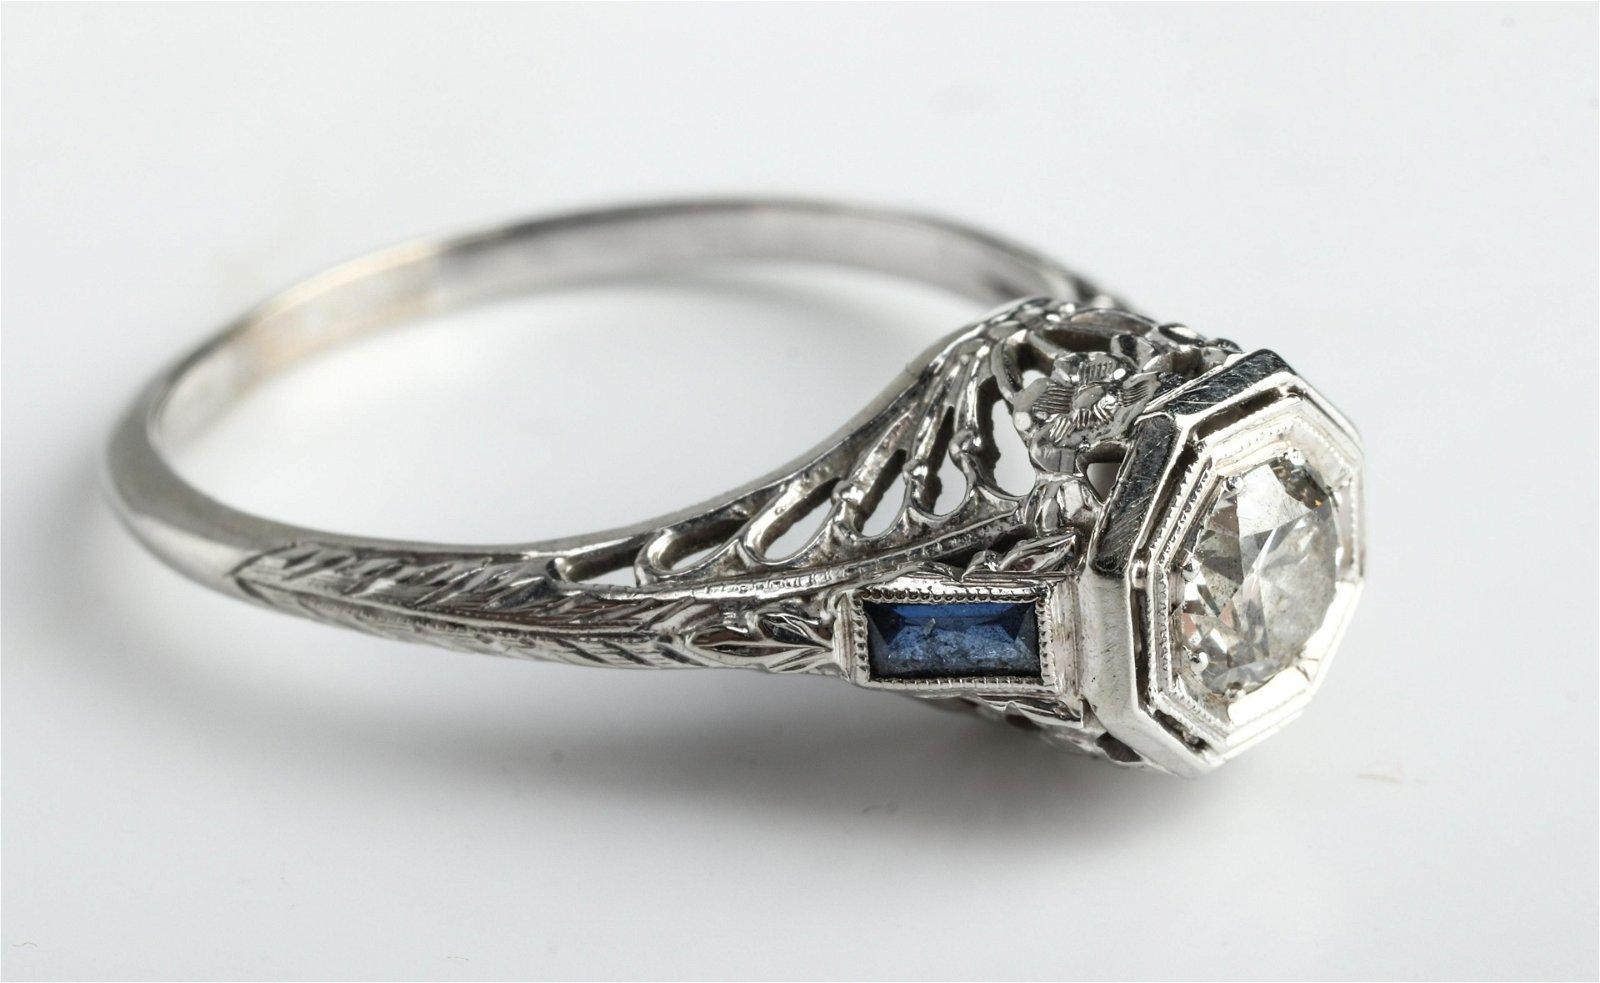 Edwardian 18K White Gold Diamond & Sapphire Ring